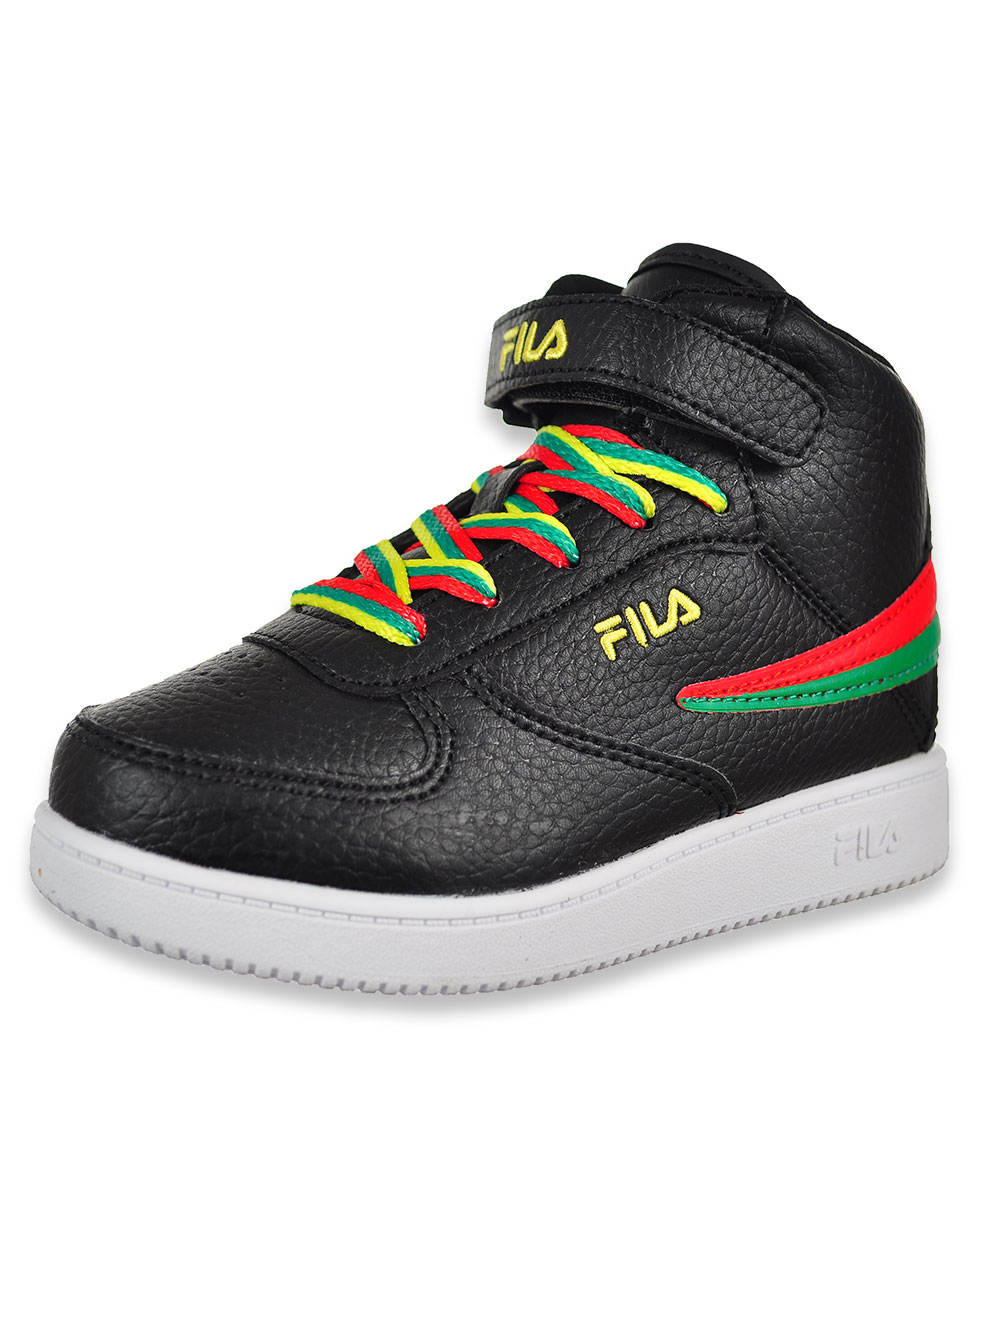 Boys' A High Hi Top Sneakers by Fila in Blackred